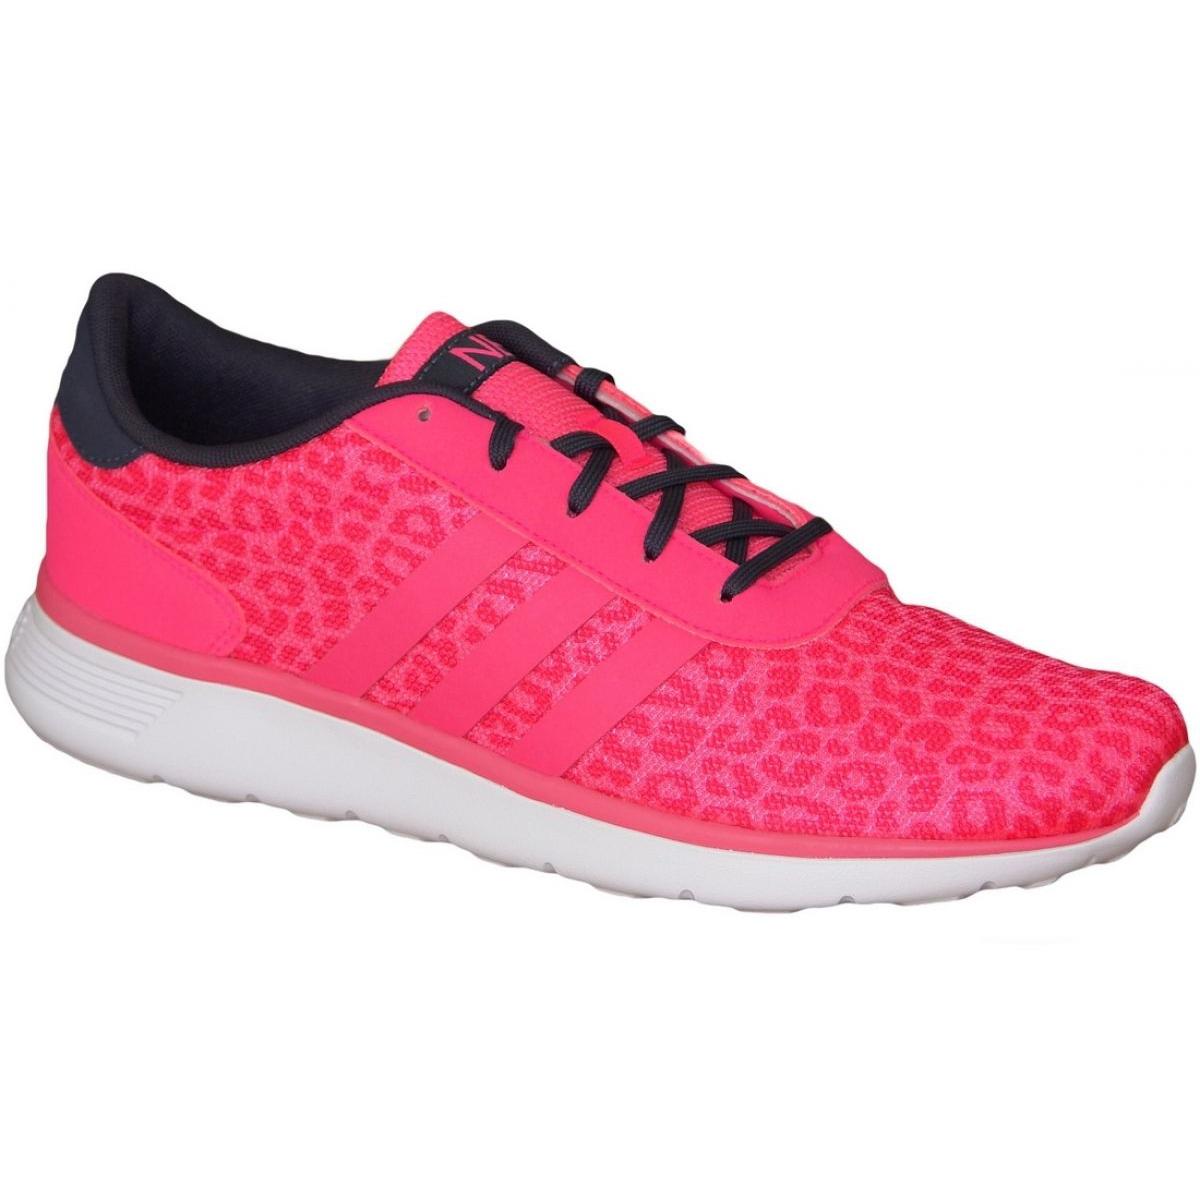 premier taux b1106 ef229 chaussure adidas orange